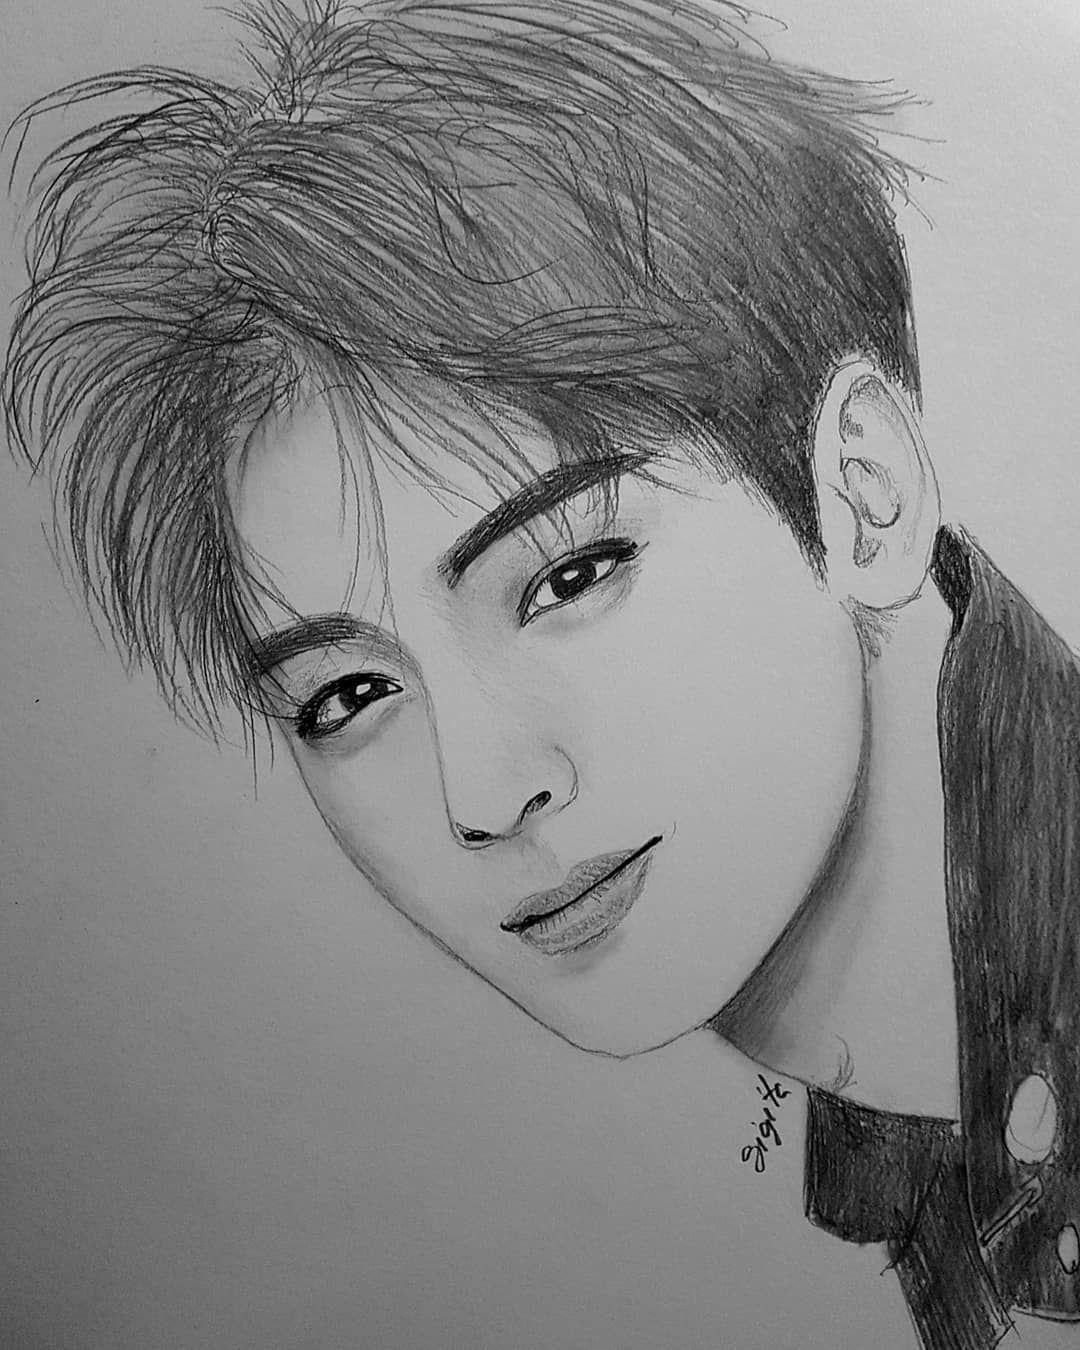 New The 10 Best Art With Pictures Enwoo Officialastro Eunwo O C Chaeunwoo Astro Boysband Singer Kpop Music Lukisan Wajah Sketsa Cara Menggambar